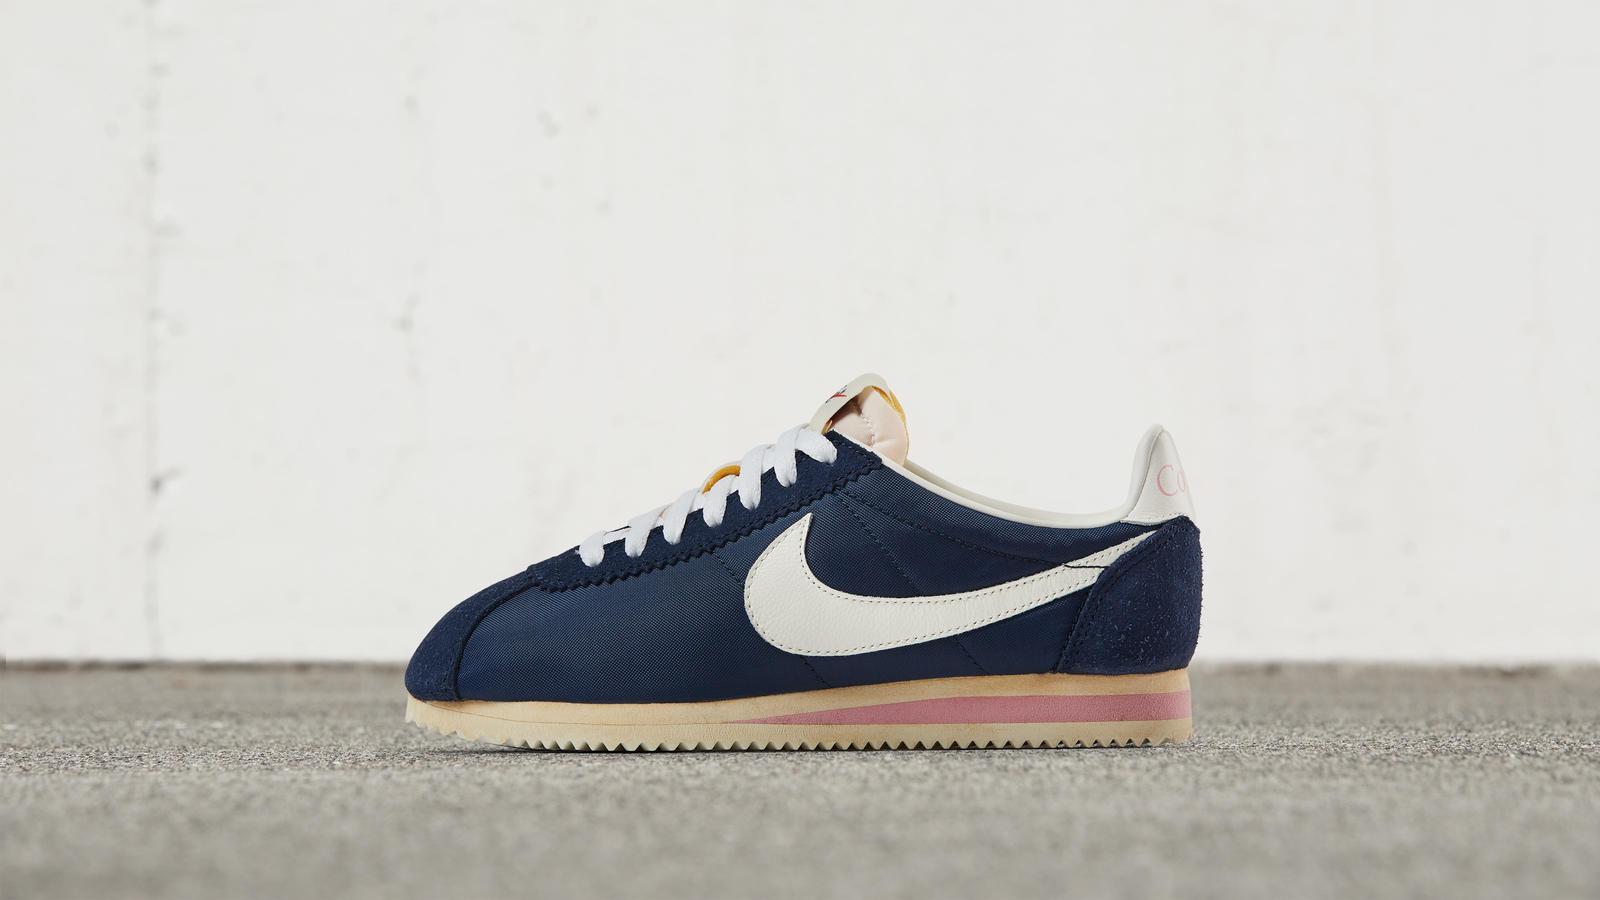 9a974aa47 Nike Cortez Premium iD by Olivia Kim - Nike News